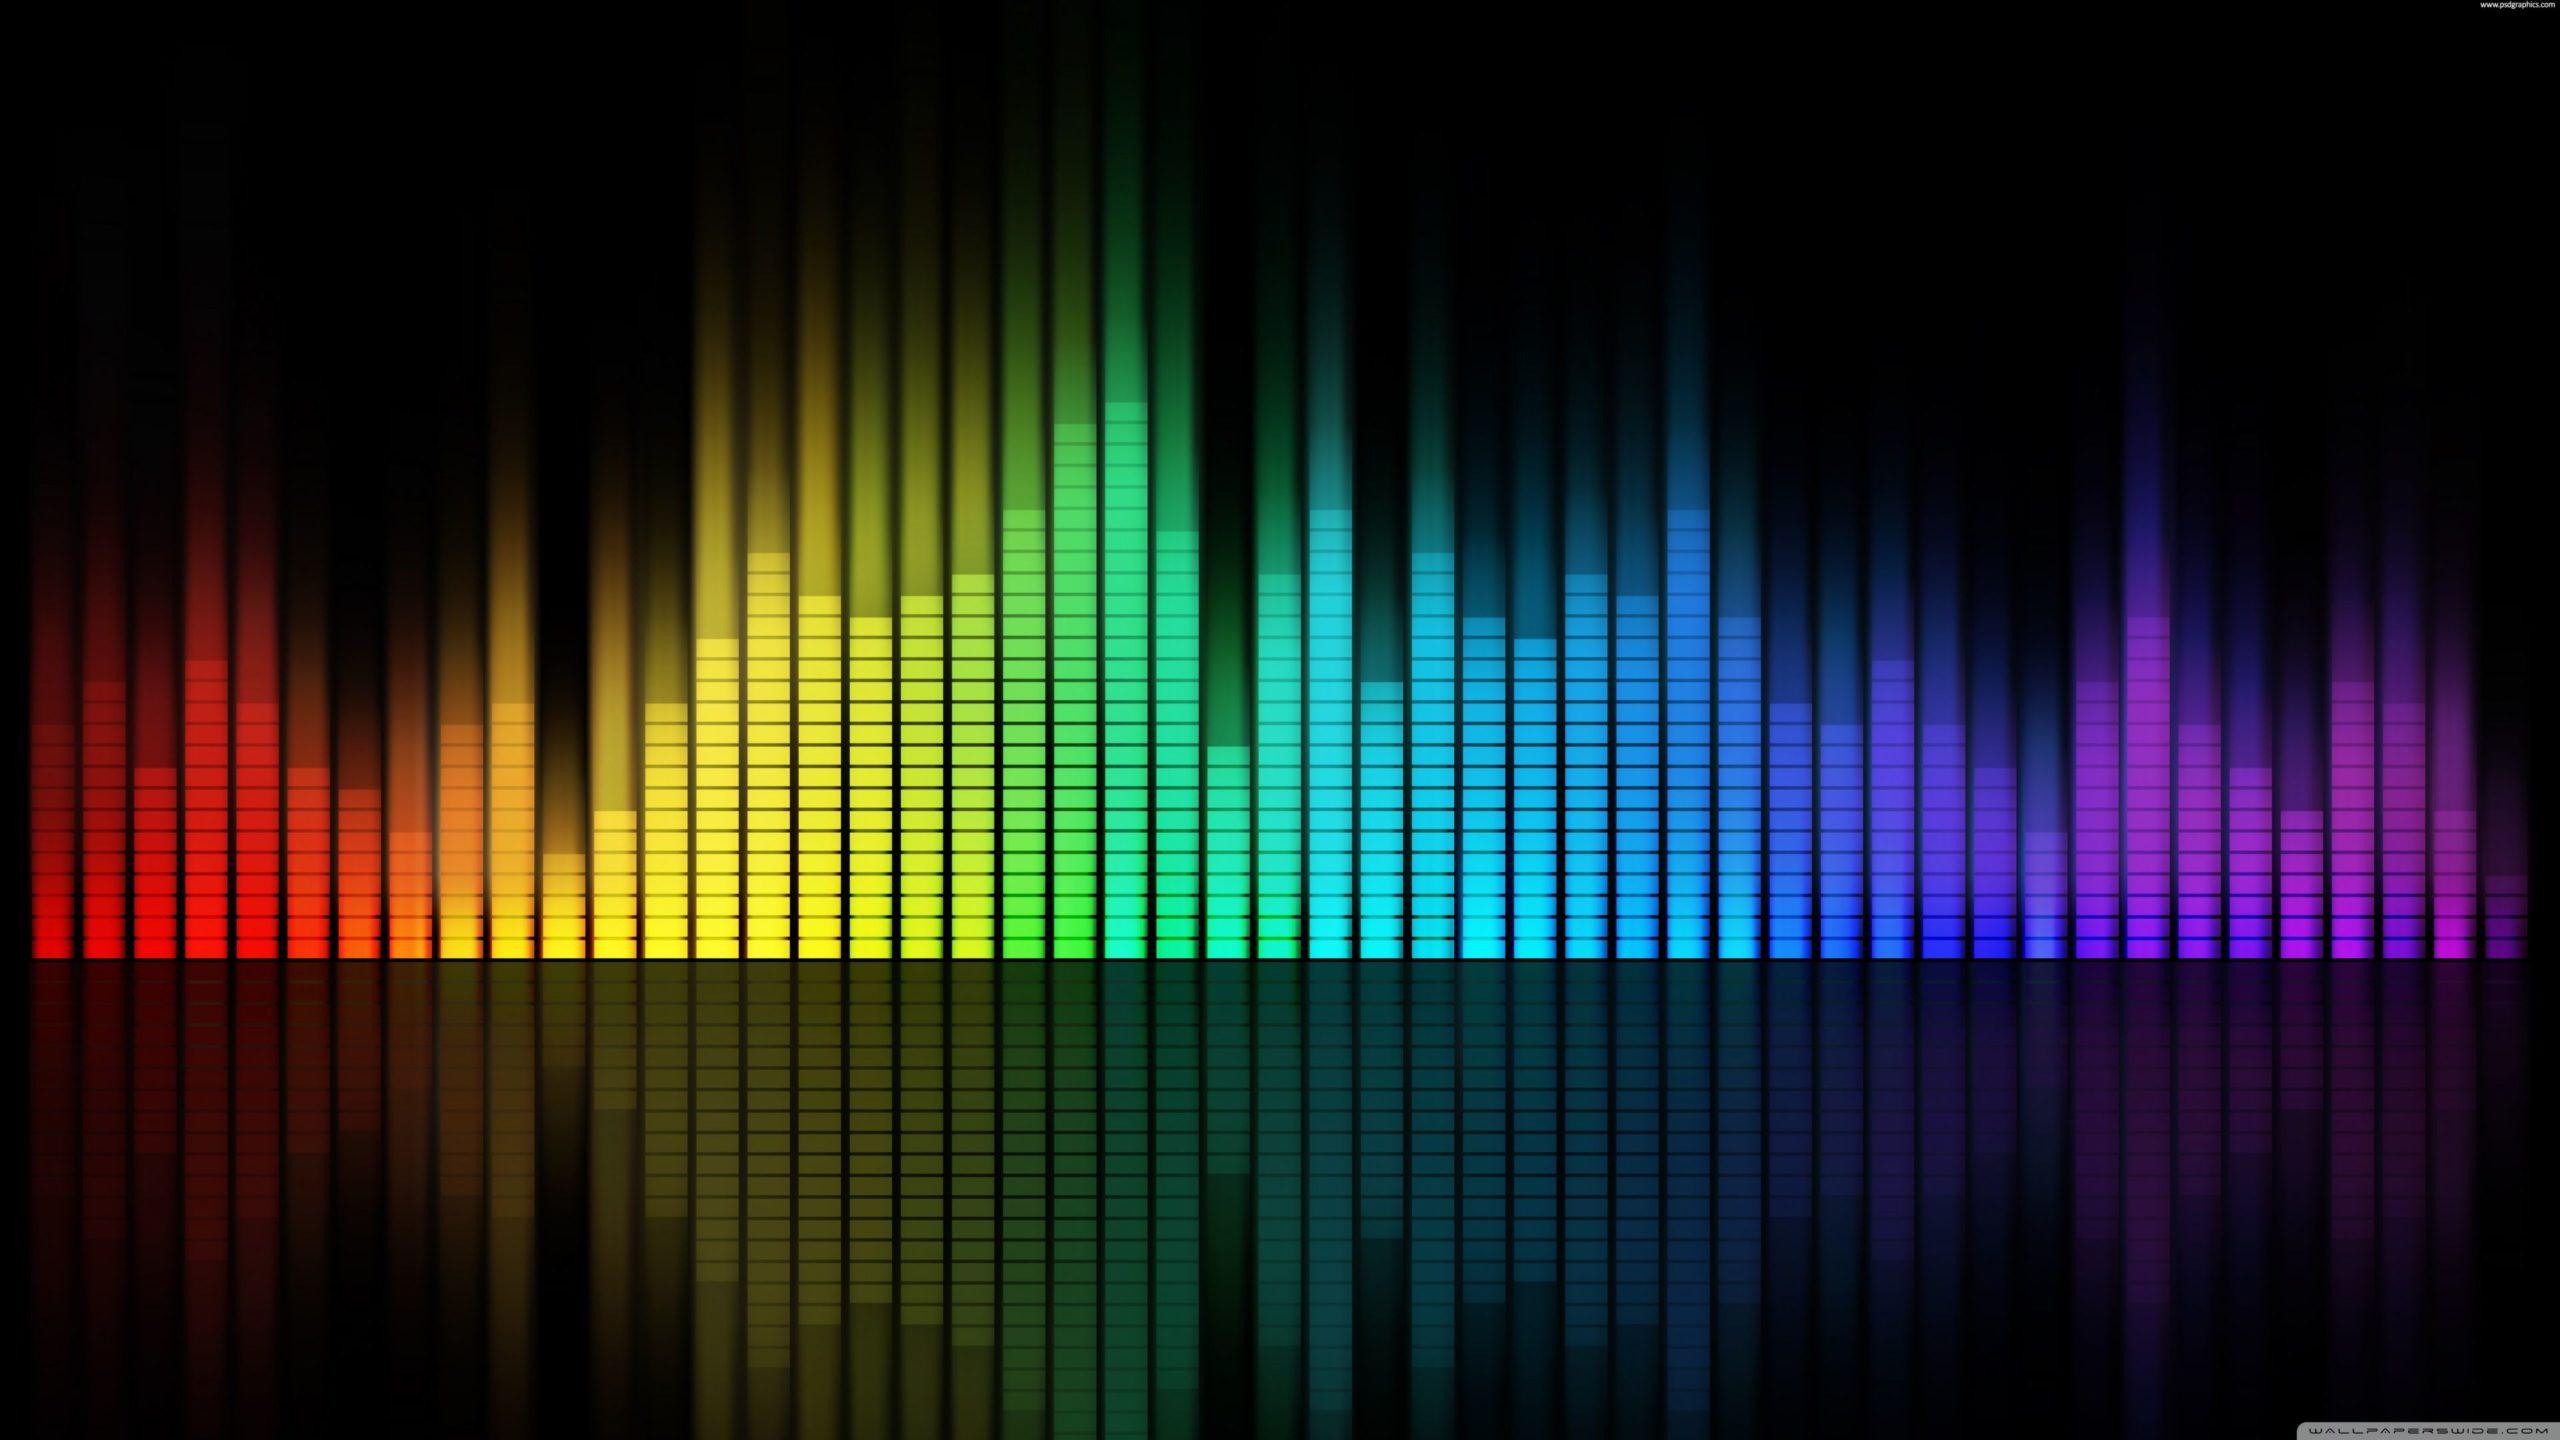 Ondas musicales 4k